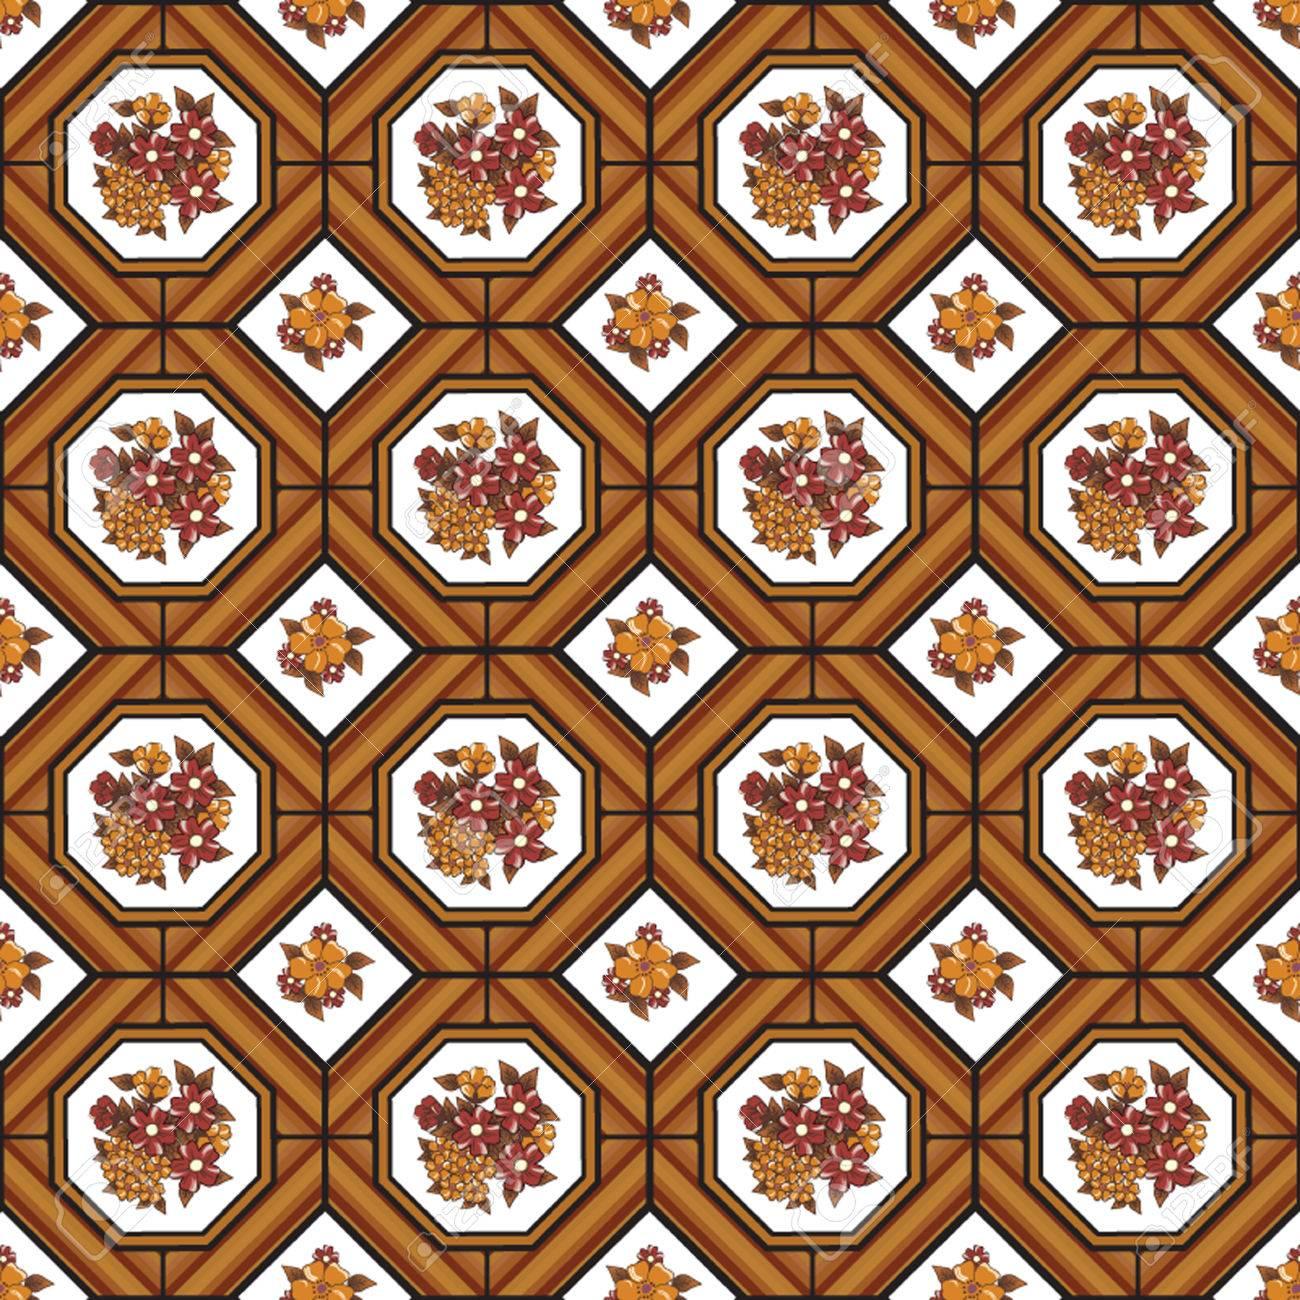 Linoleumboden muster  Wohnzimmerz: Linoleumboden Muster With Tilo Linoleum Fertigboden ...